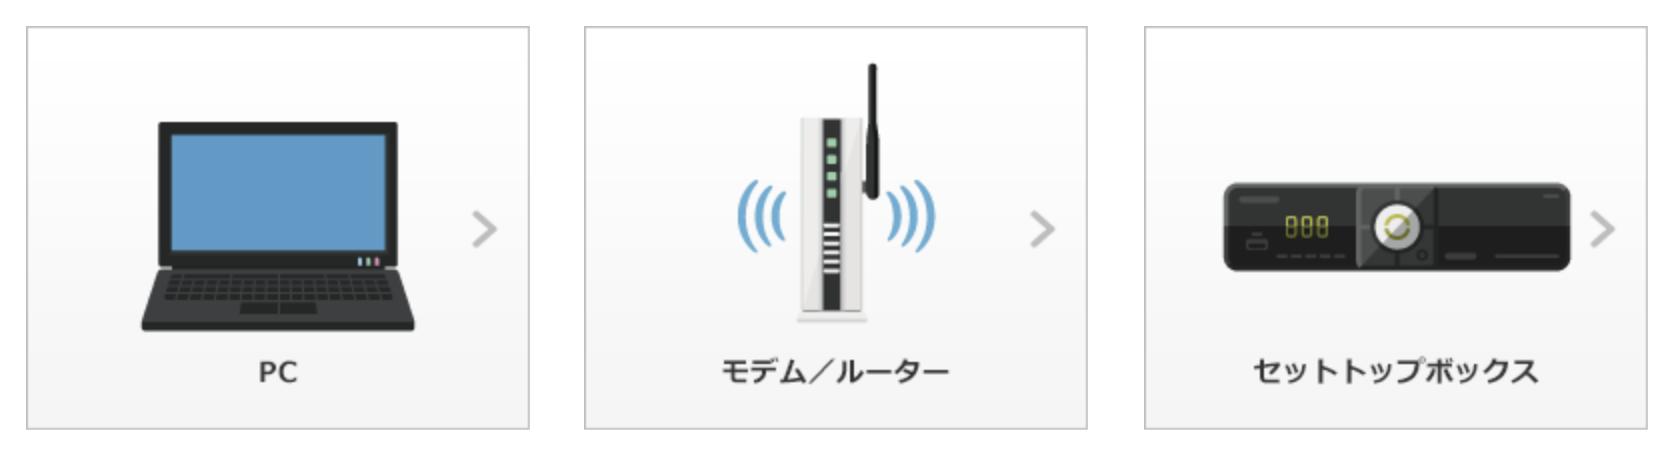 J:COM_解約_ネット_遅い